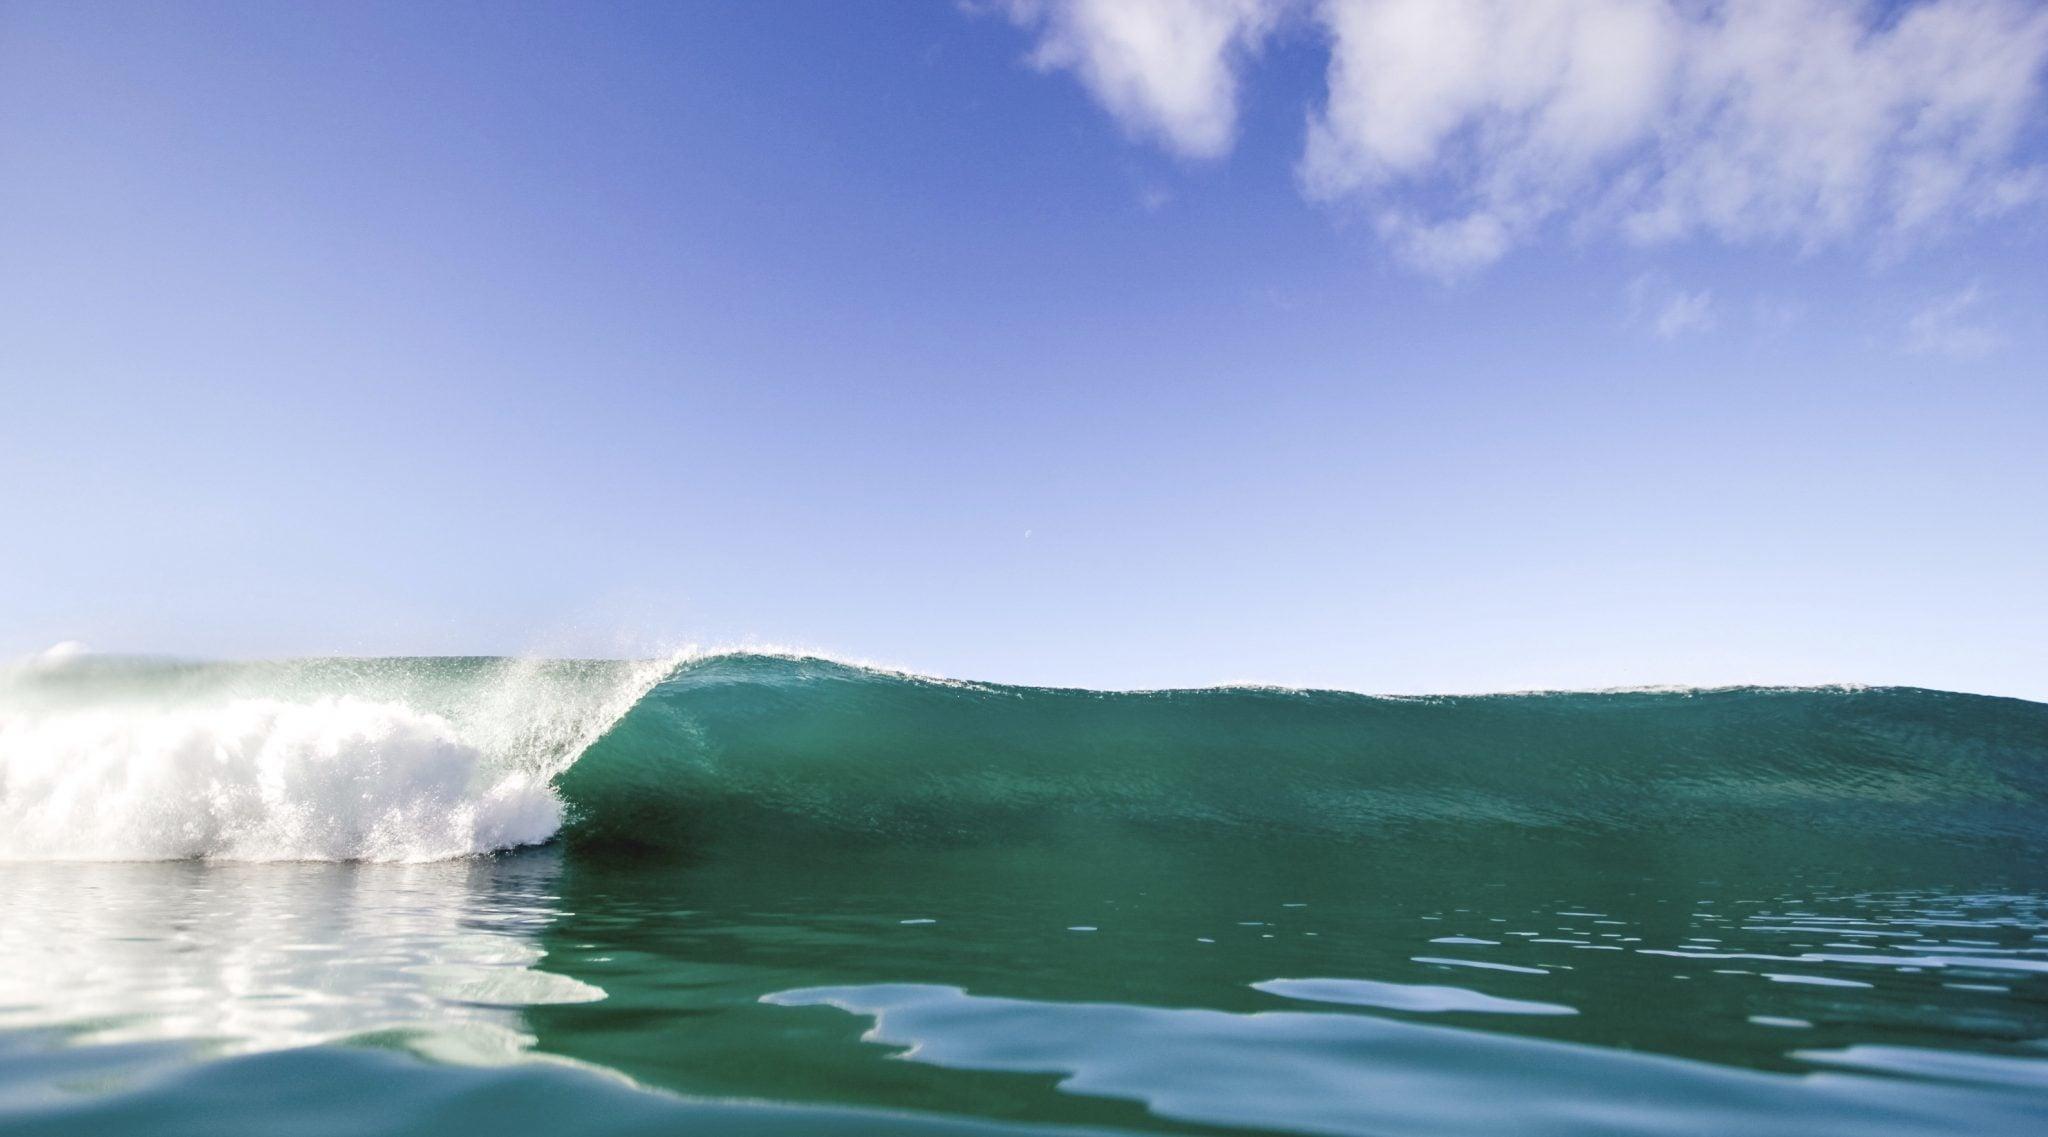 HR Future is bright - Next waves